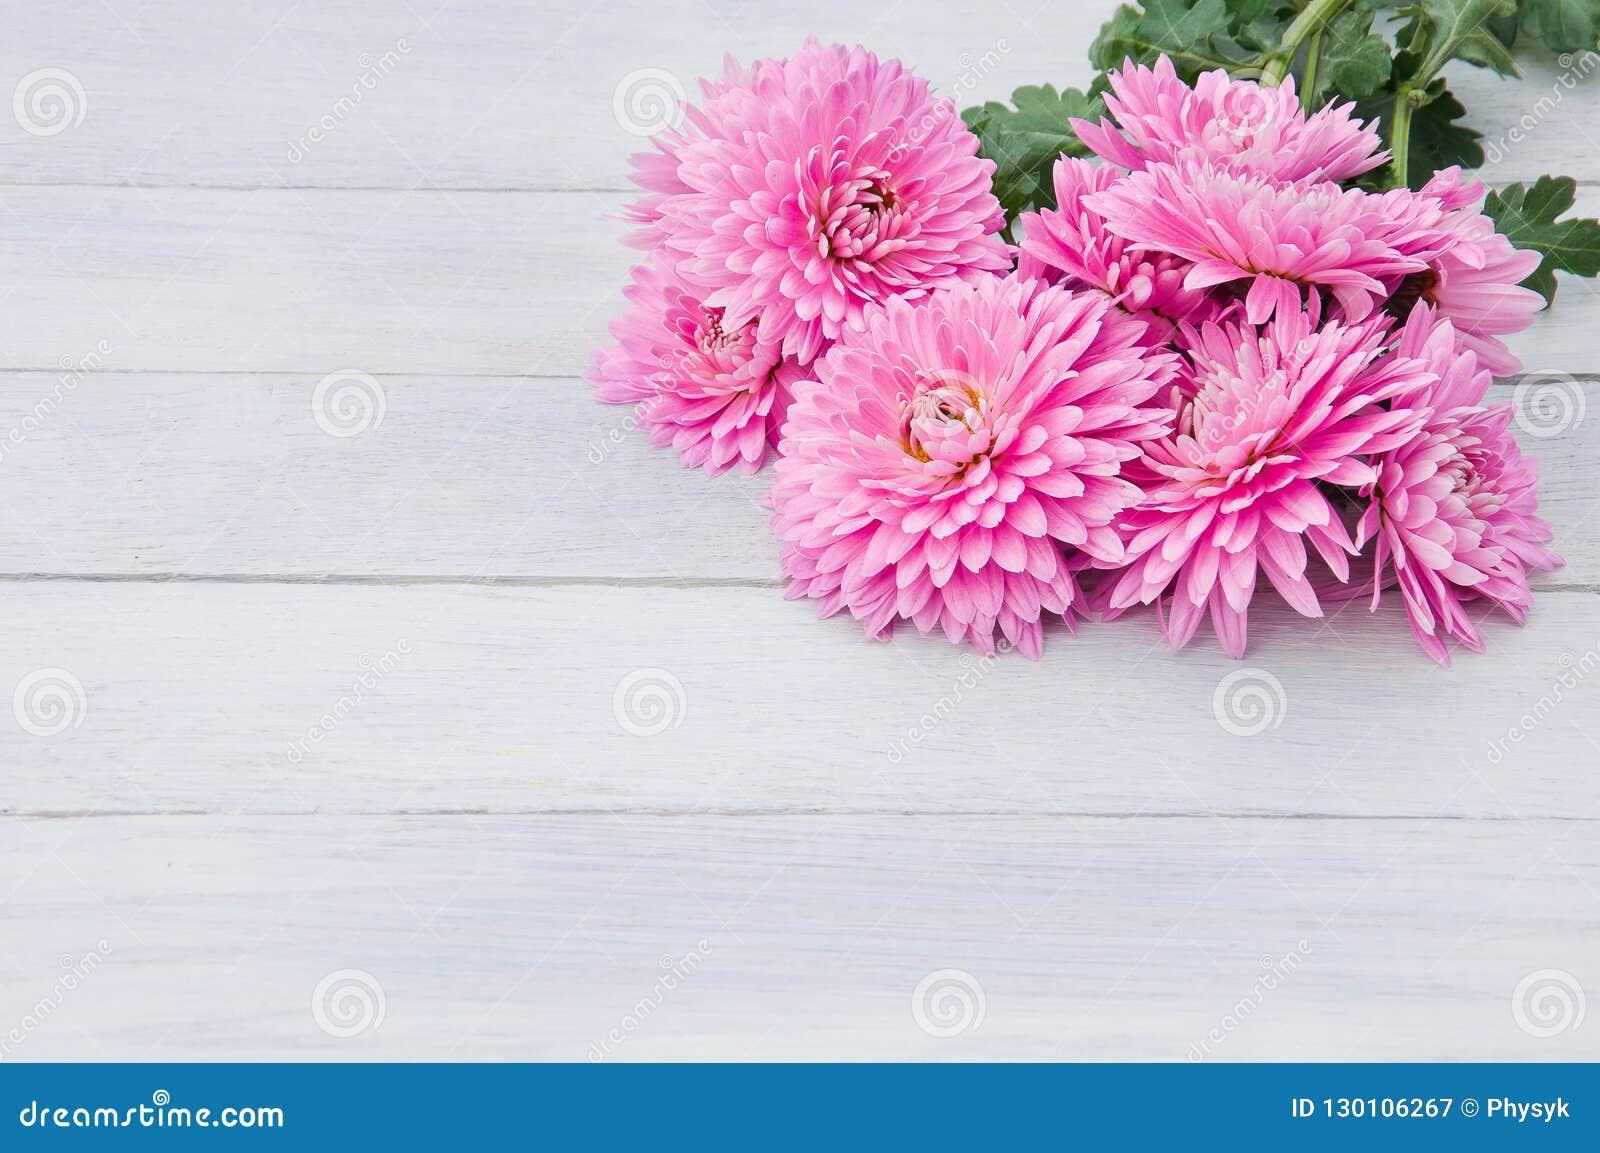 Flores rosas claras apacibles de crisantemos en vagos de madera blancos